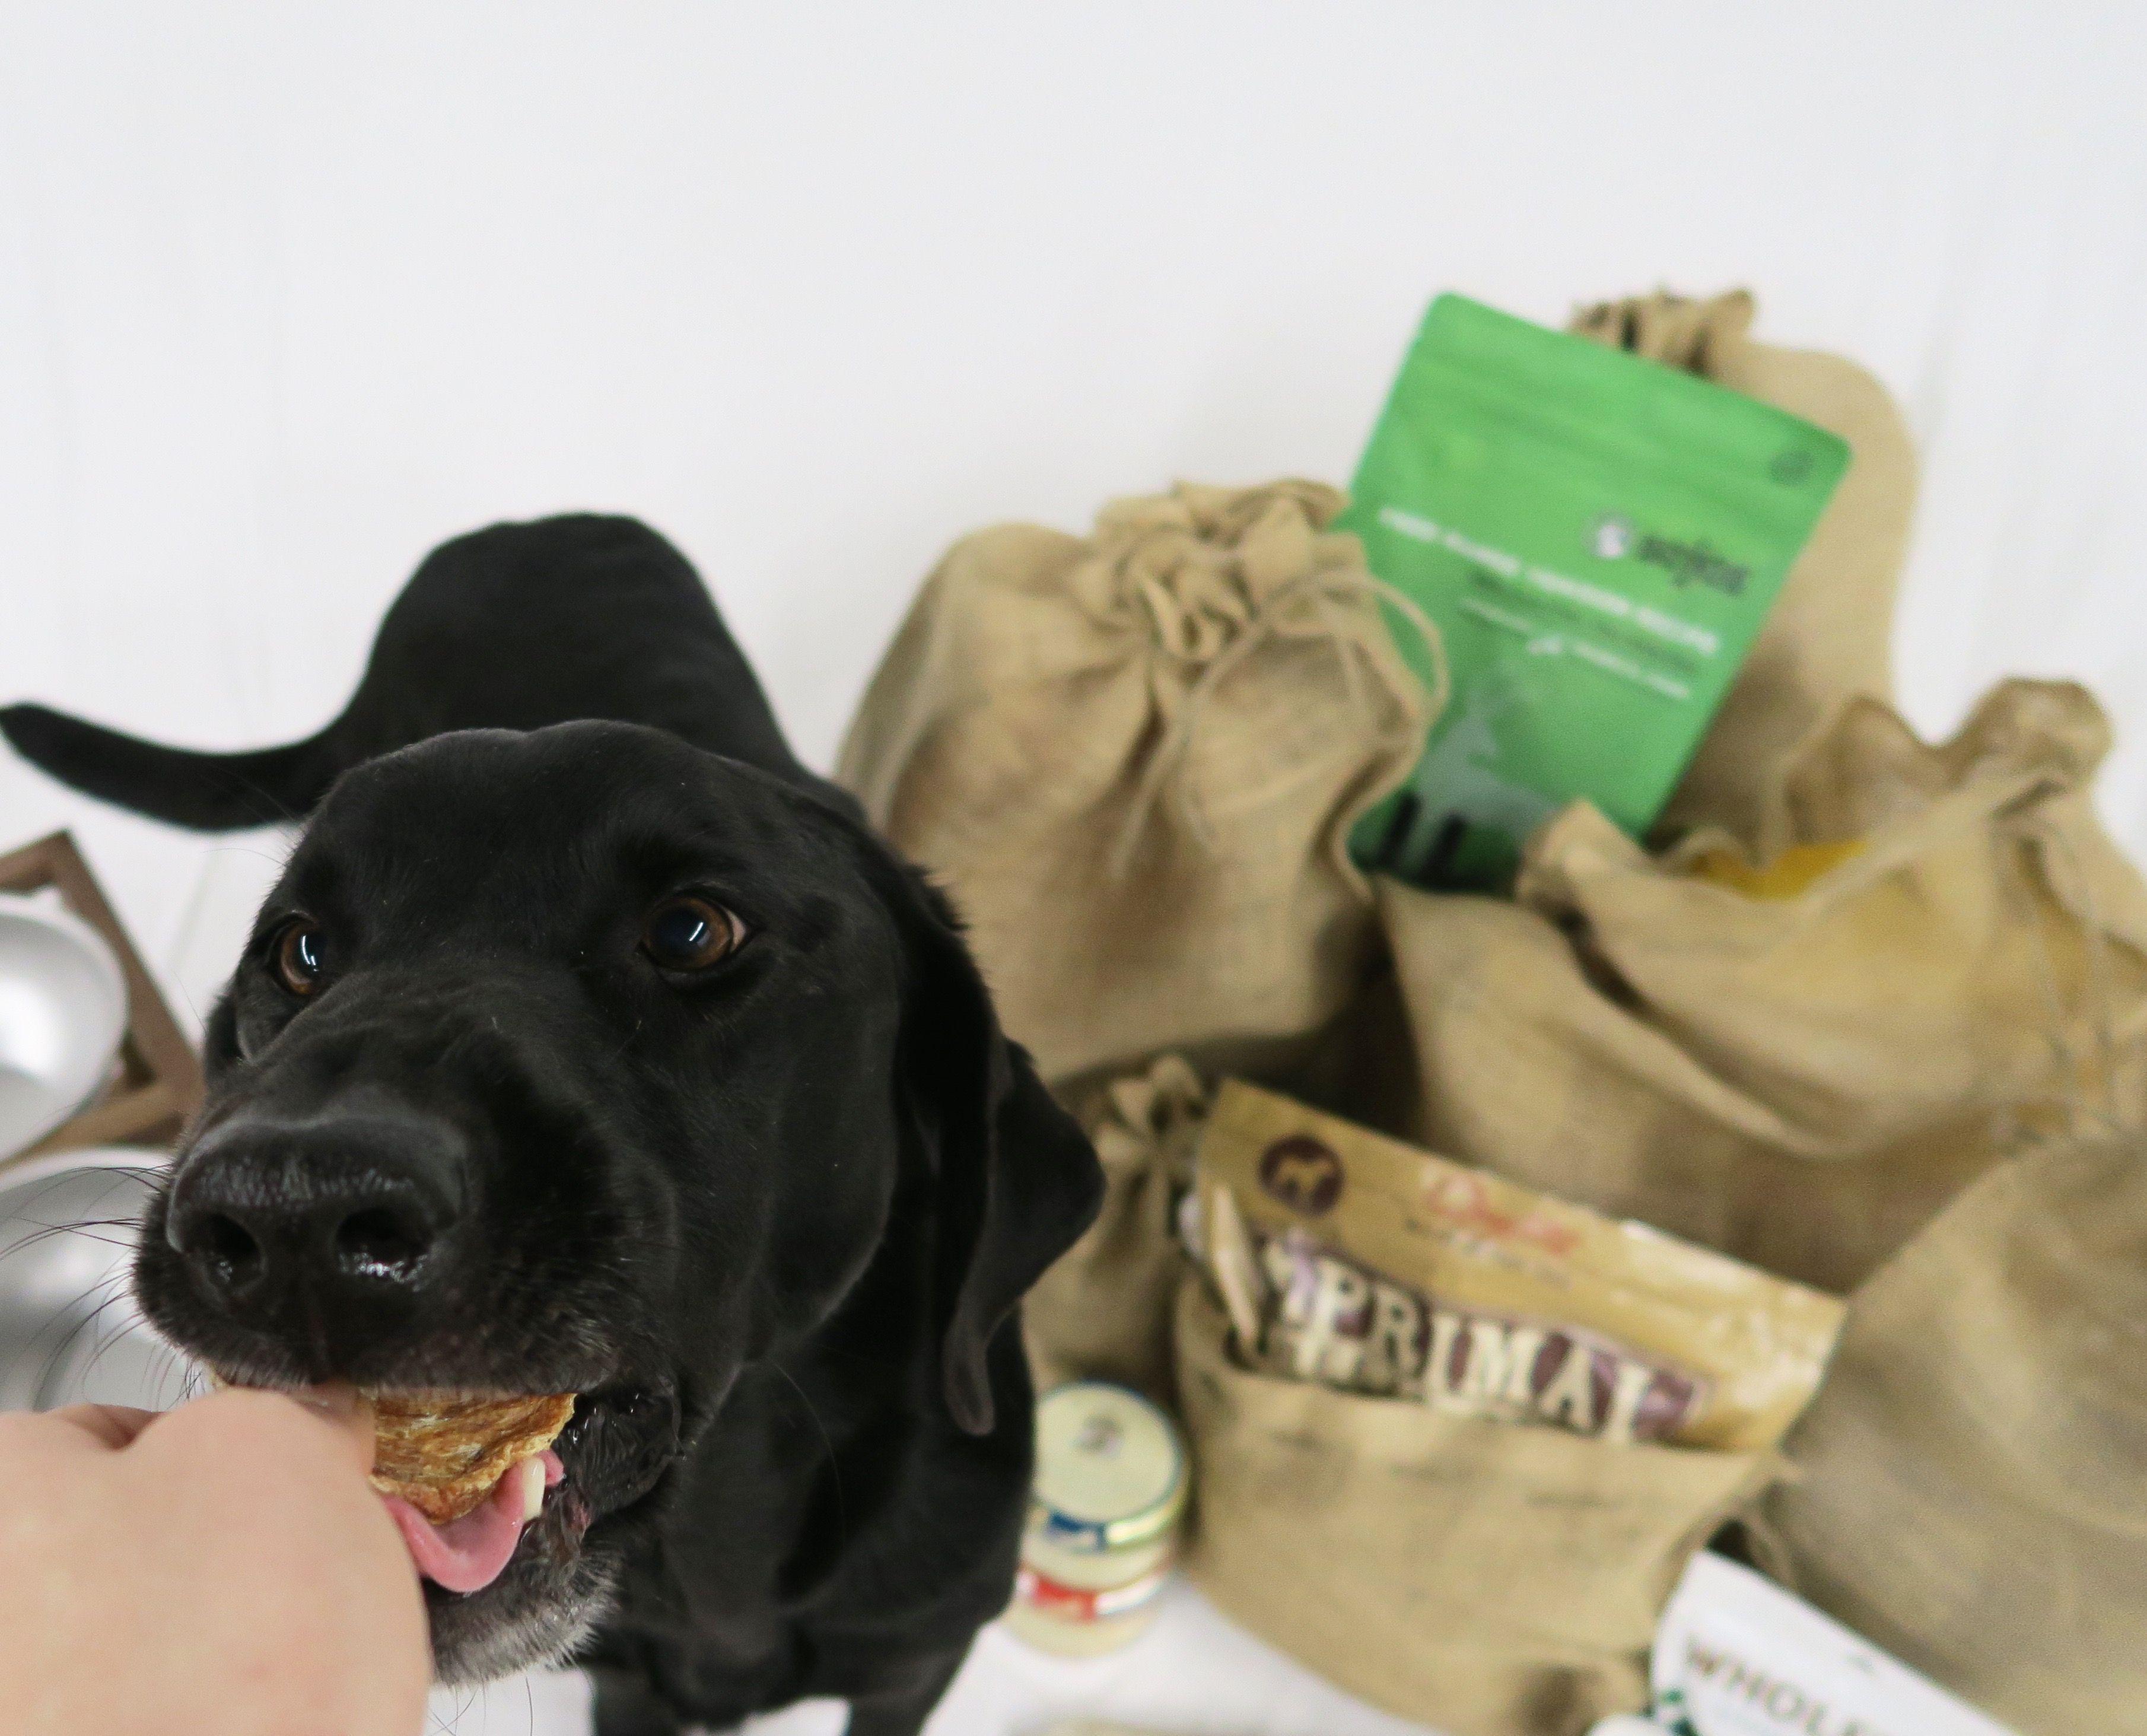 primalpet sojospetfood Animal companions, Pets, Animals